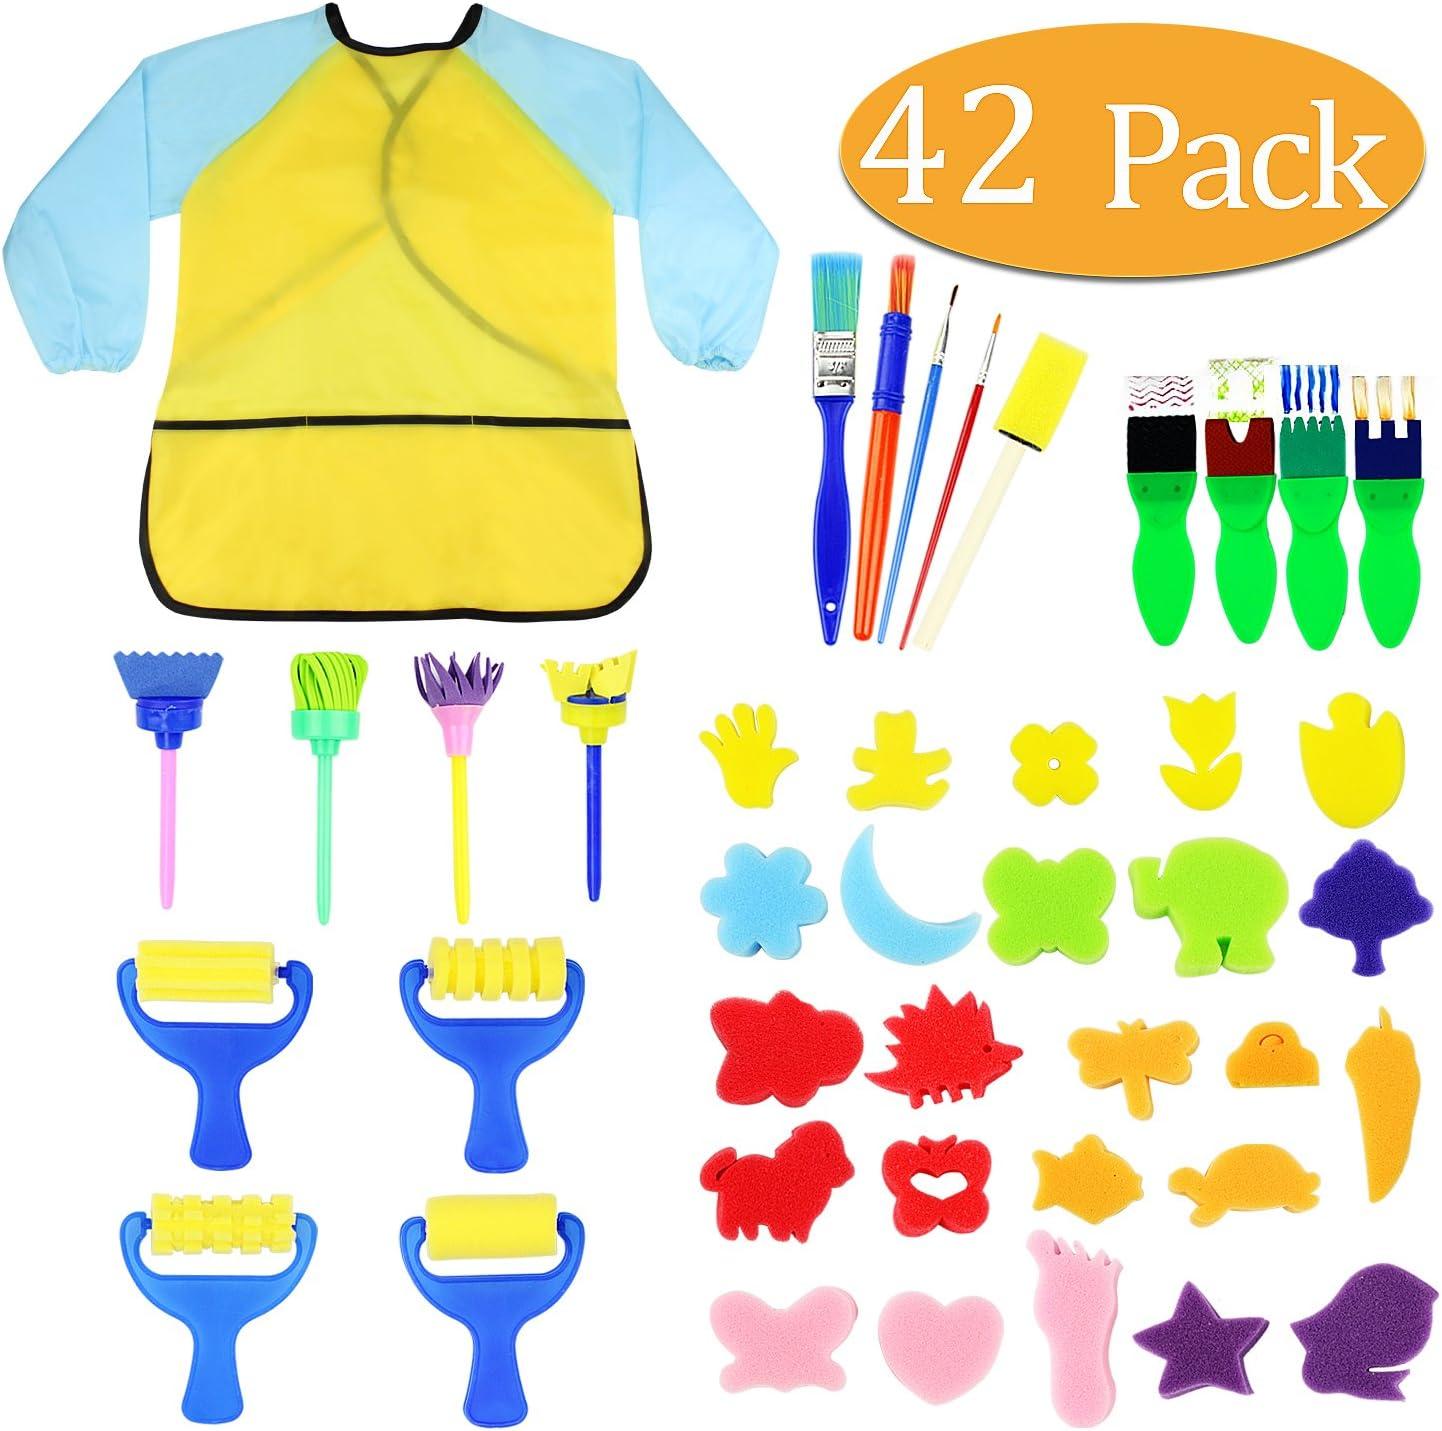 30 pcs//Lot Foam Sponge Brushes Wooden Handle Painting Drawing Craft Draw Brushes Sponge Painting Brushes